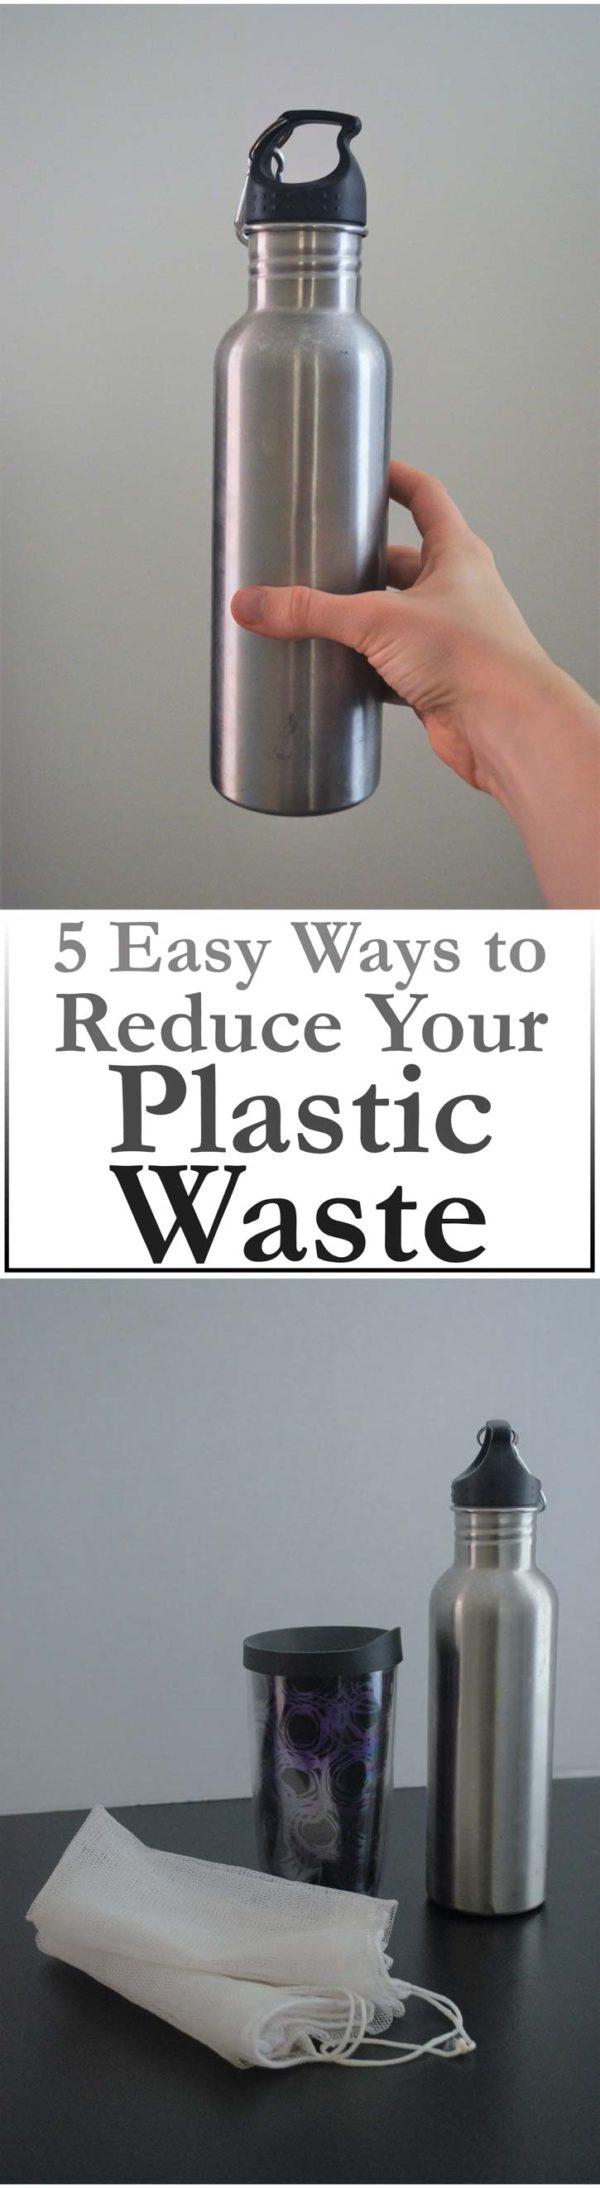 plastic waste reduction zero waste environmentally friendly